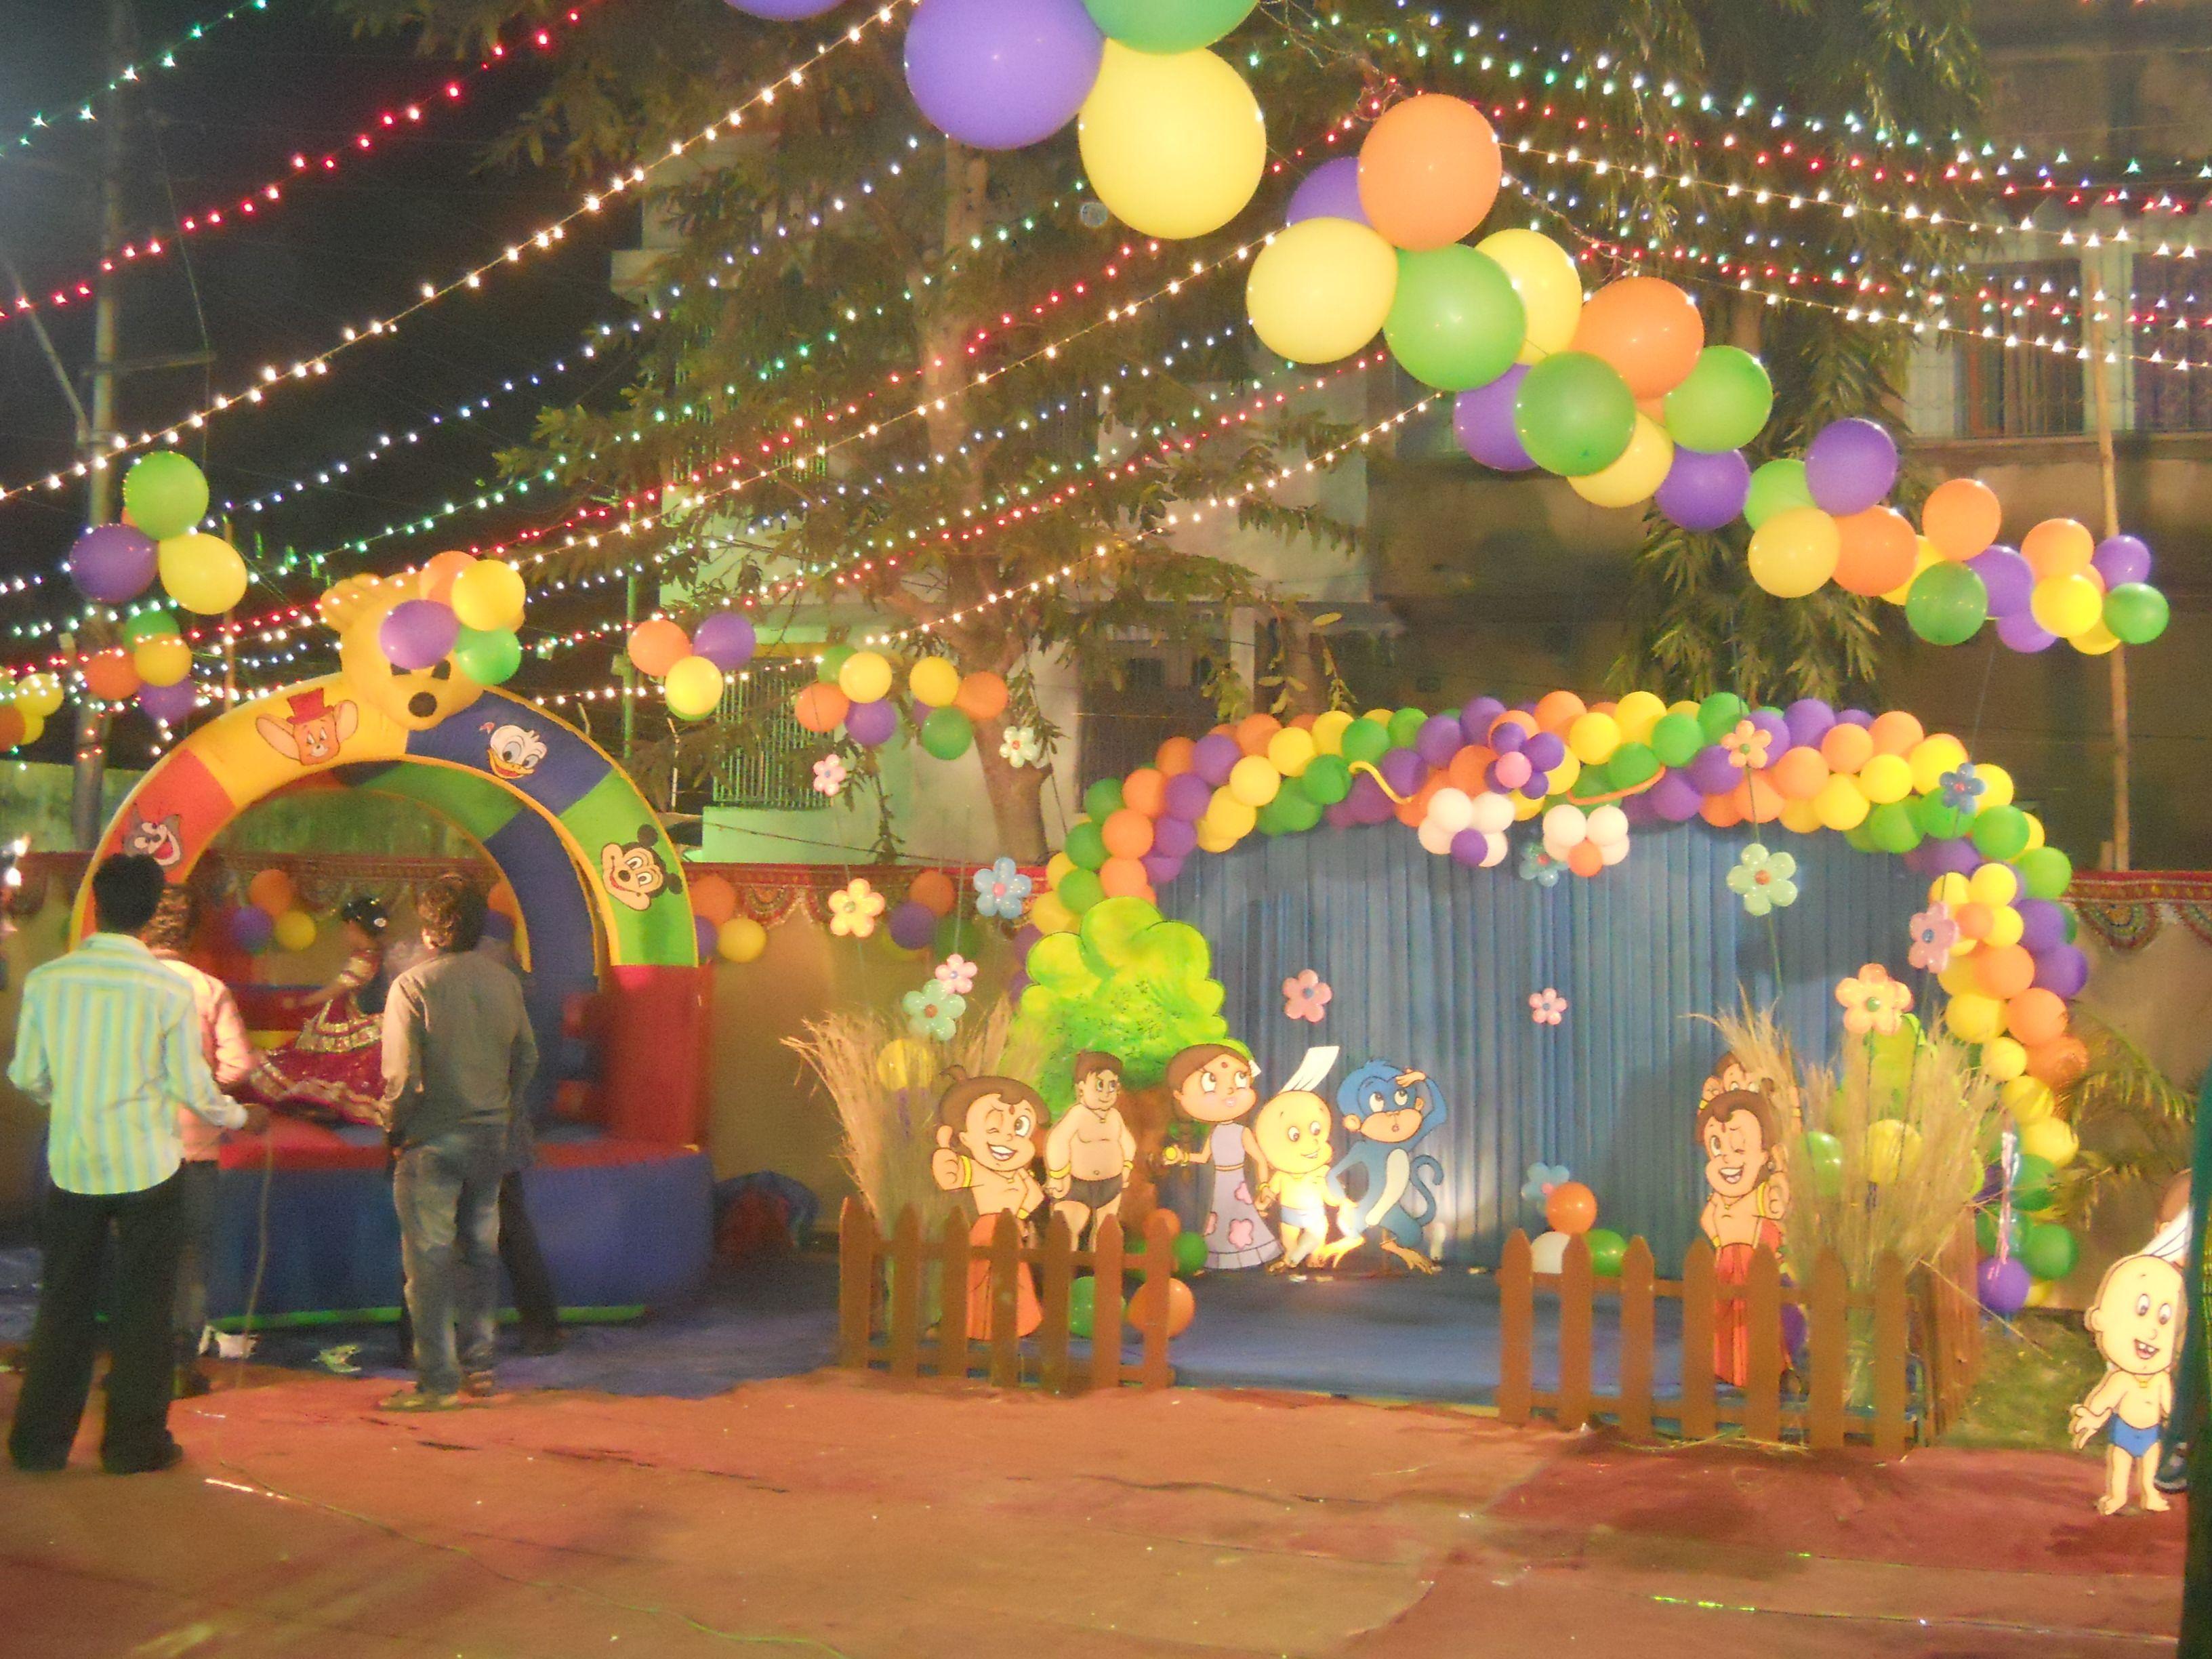 Chhota Bheem Theme 8 Stars Most Beautiful Birthday Party Themes